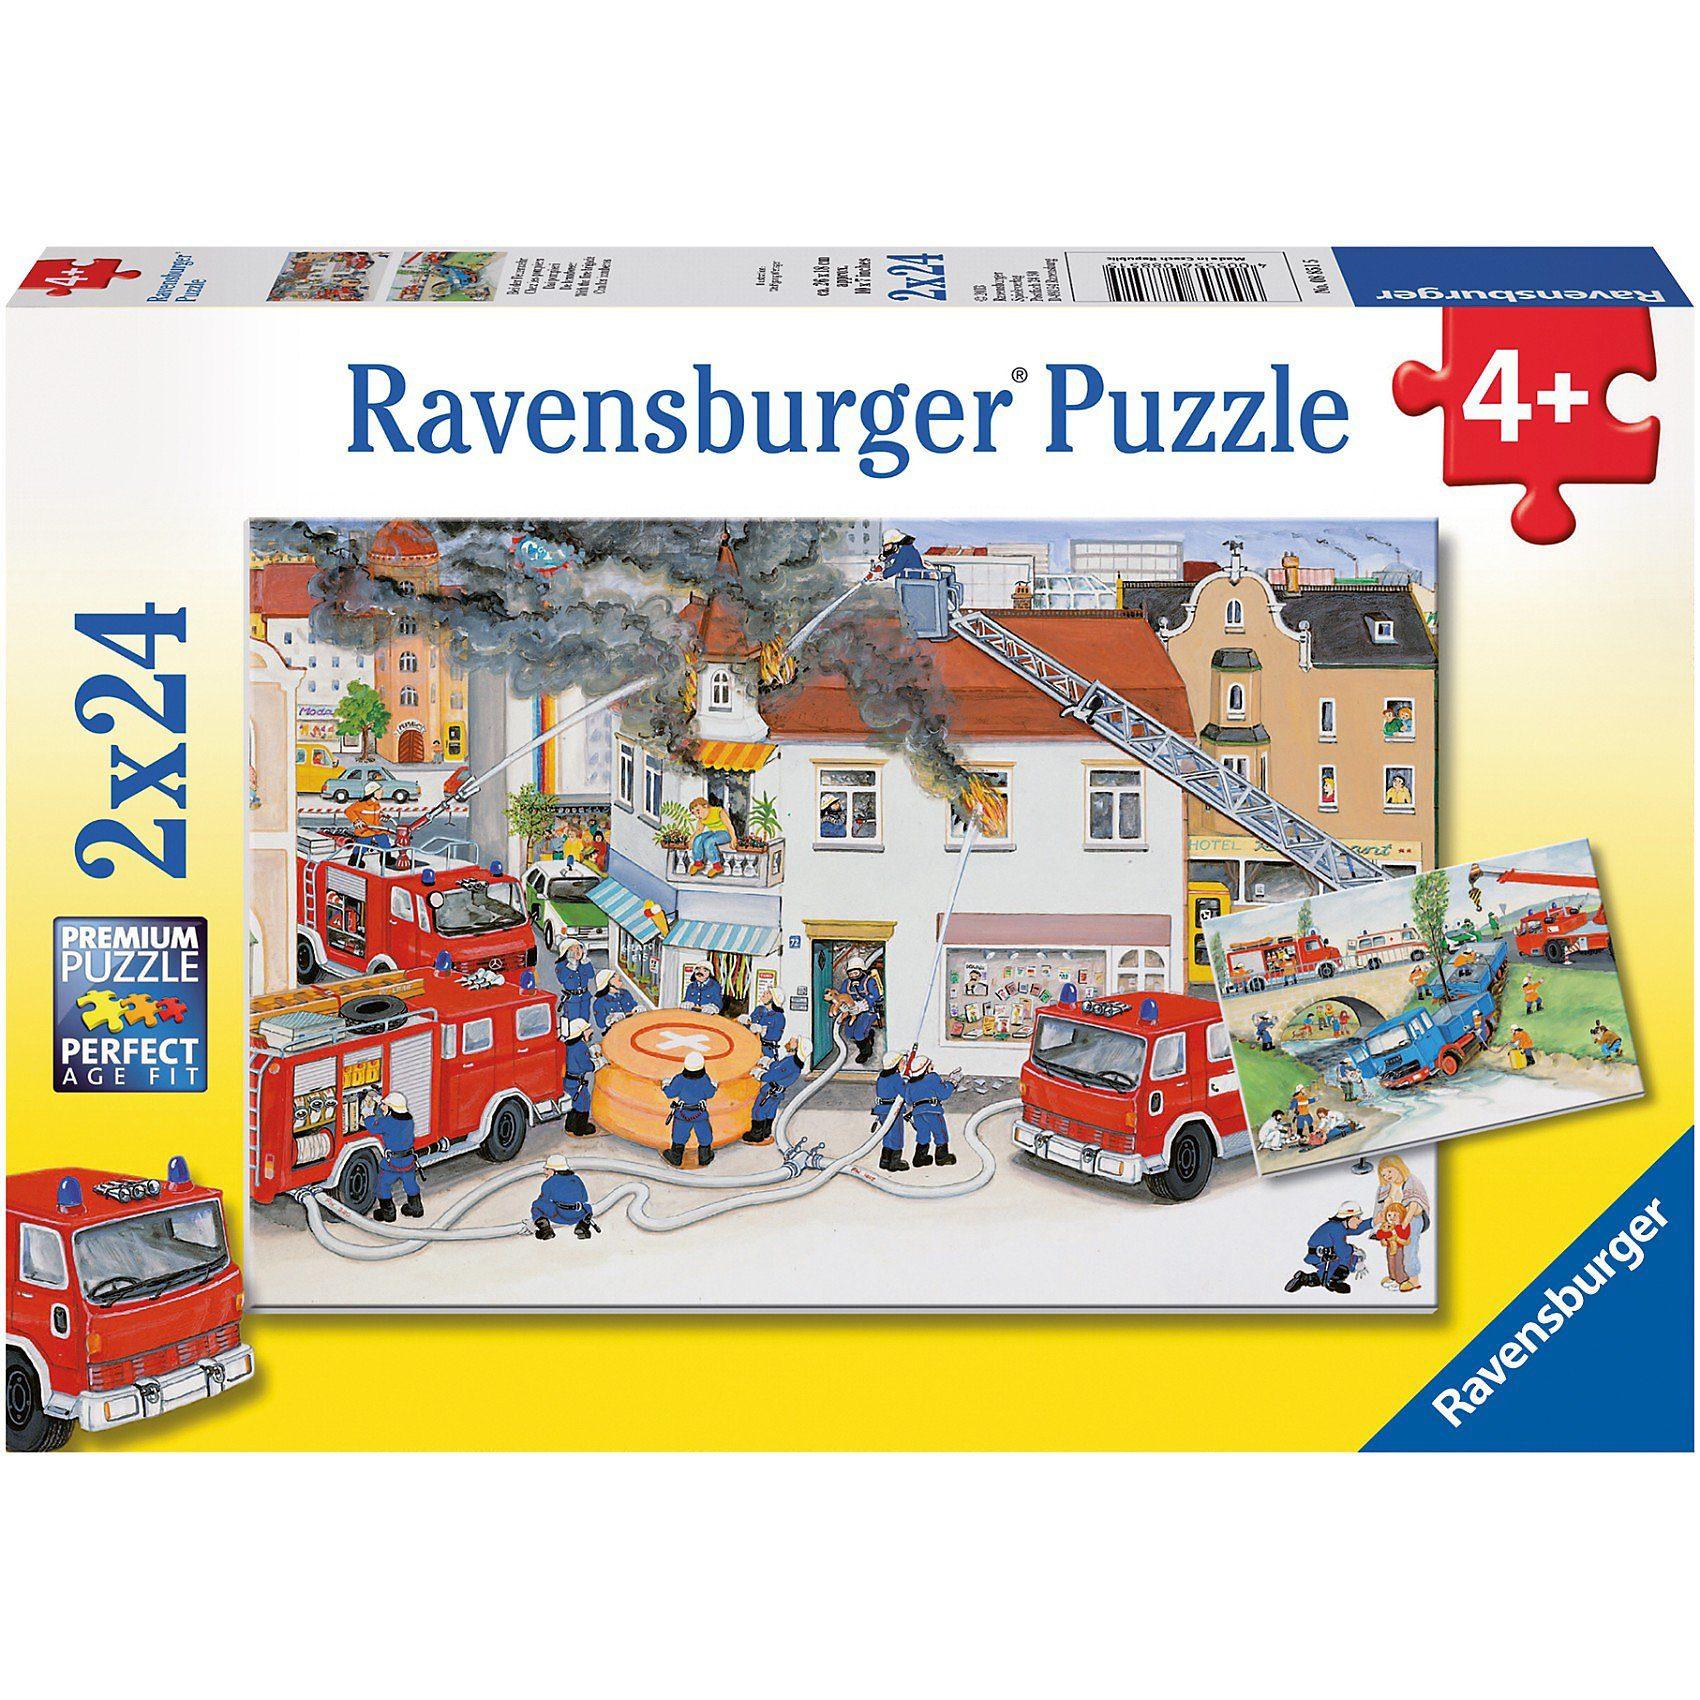 Ravensburger 2er Set Puzzle, je 24 Teile, 26x18 cm, Bei der Feuerwehr